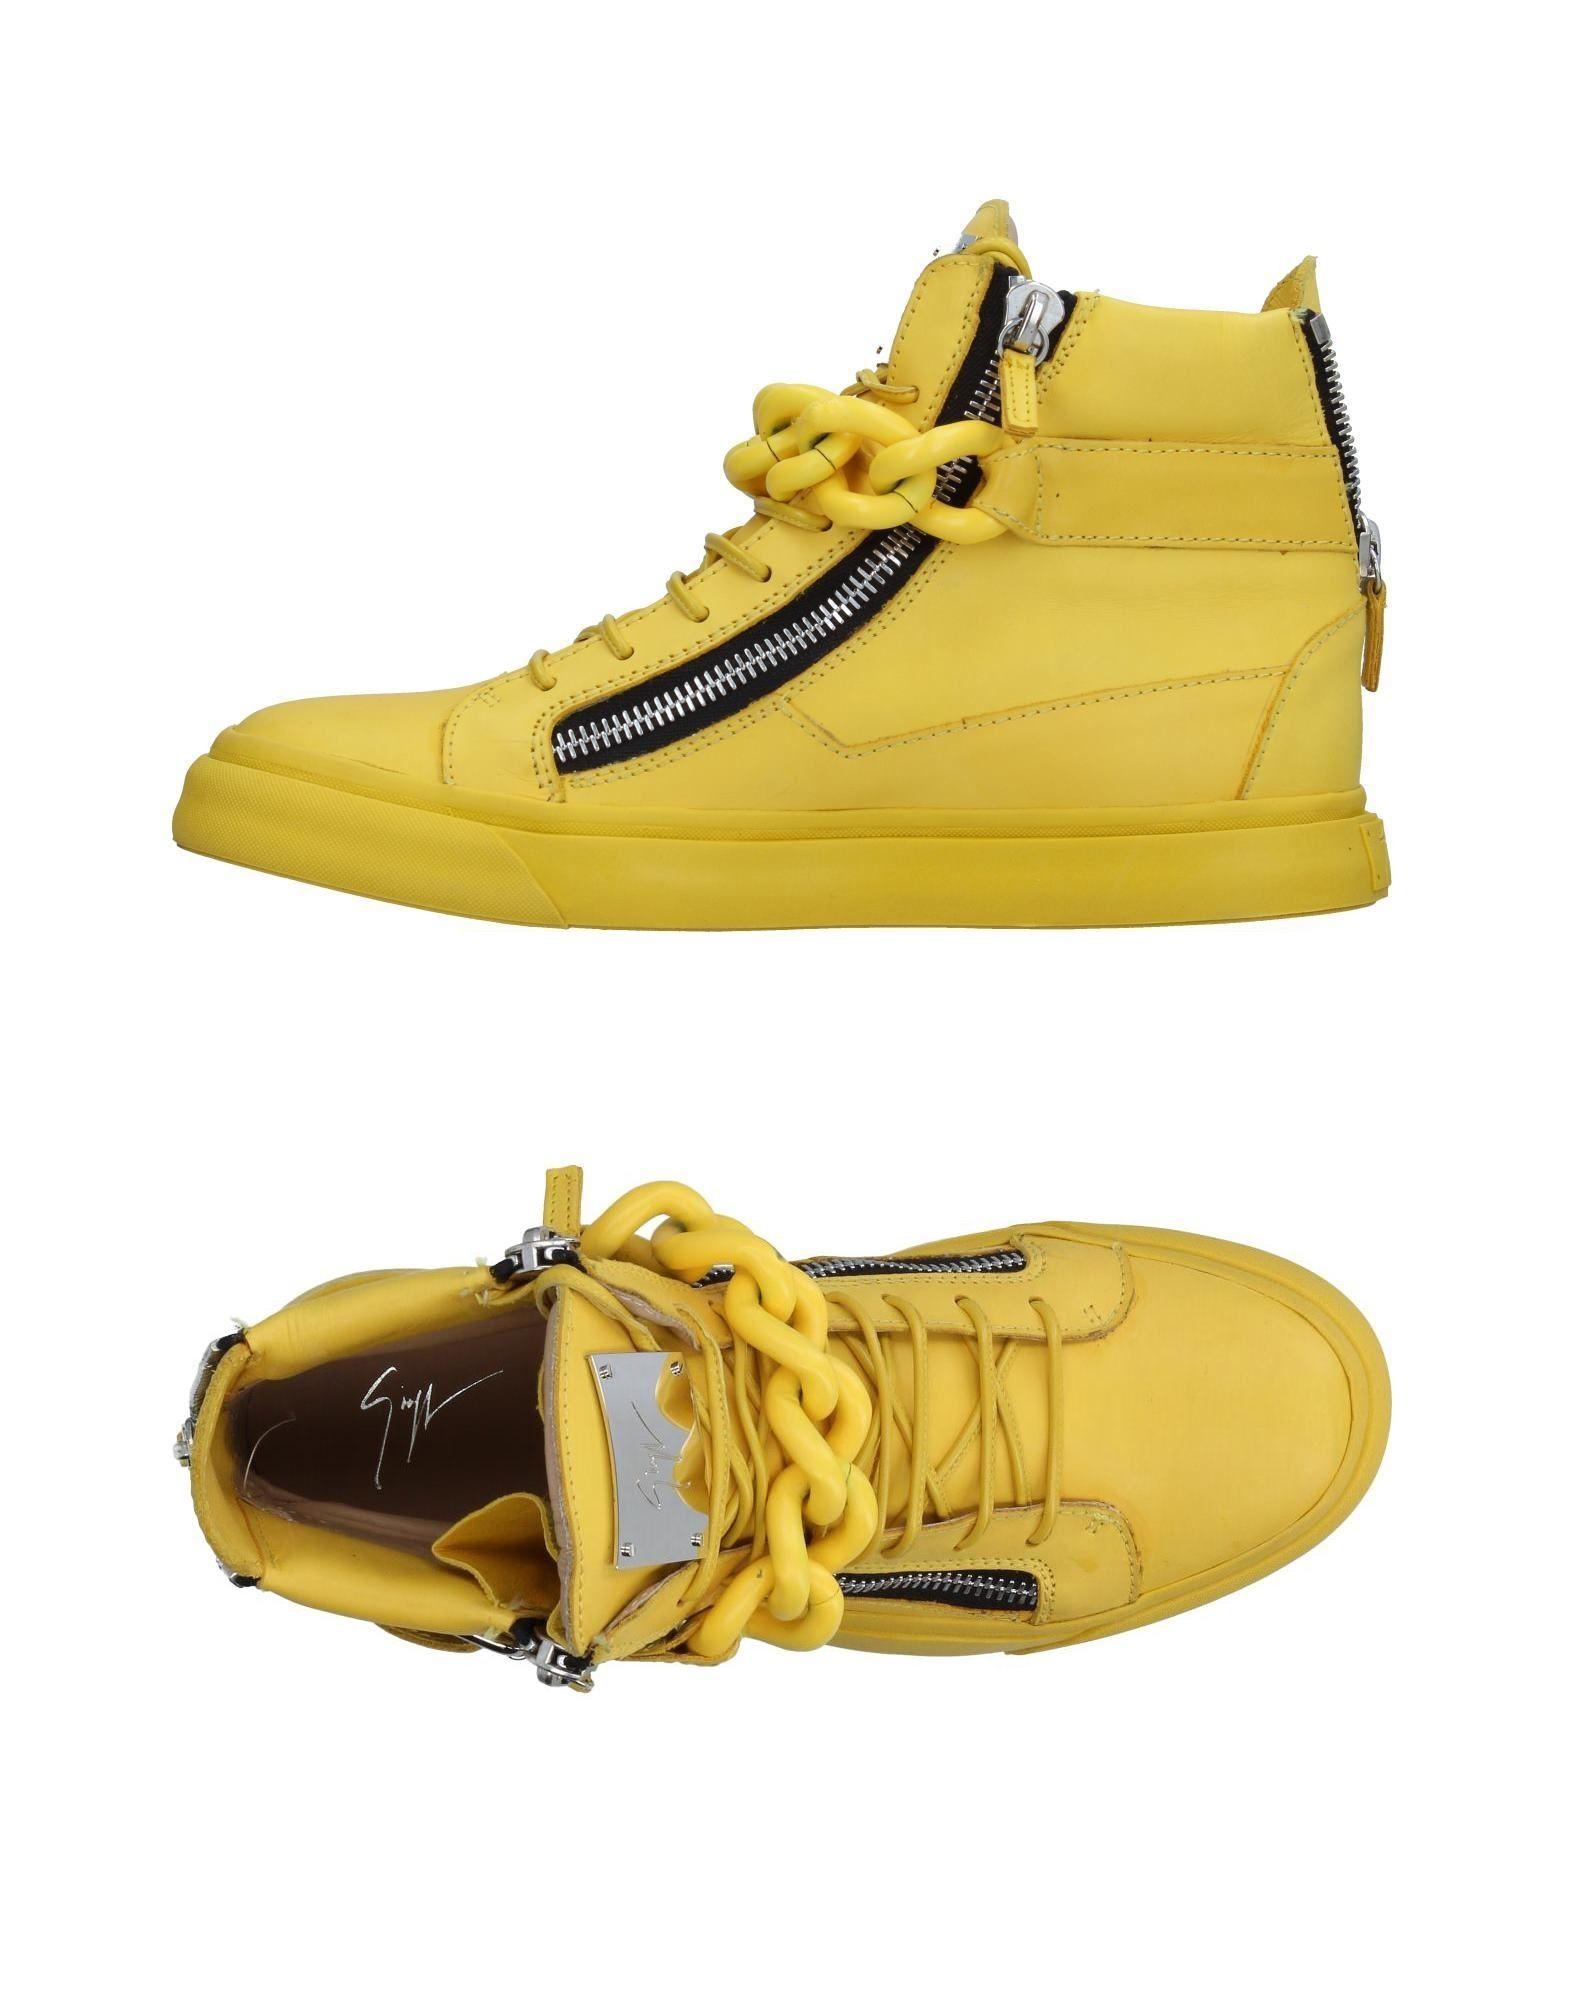 GIUSEPPE ZANOTTI DESIGN Herren High Sneakers & Tennisschuhe Farbe Gelb Größe 9 - broschei